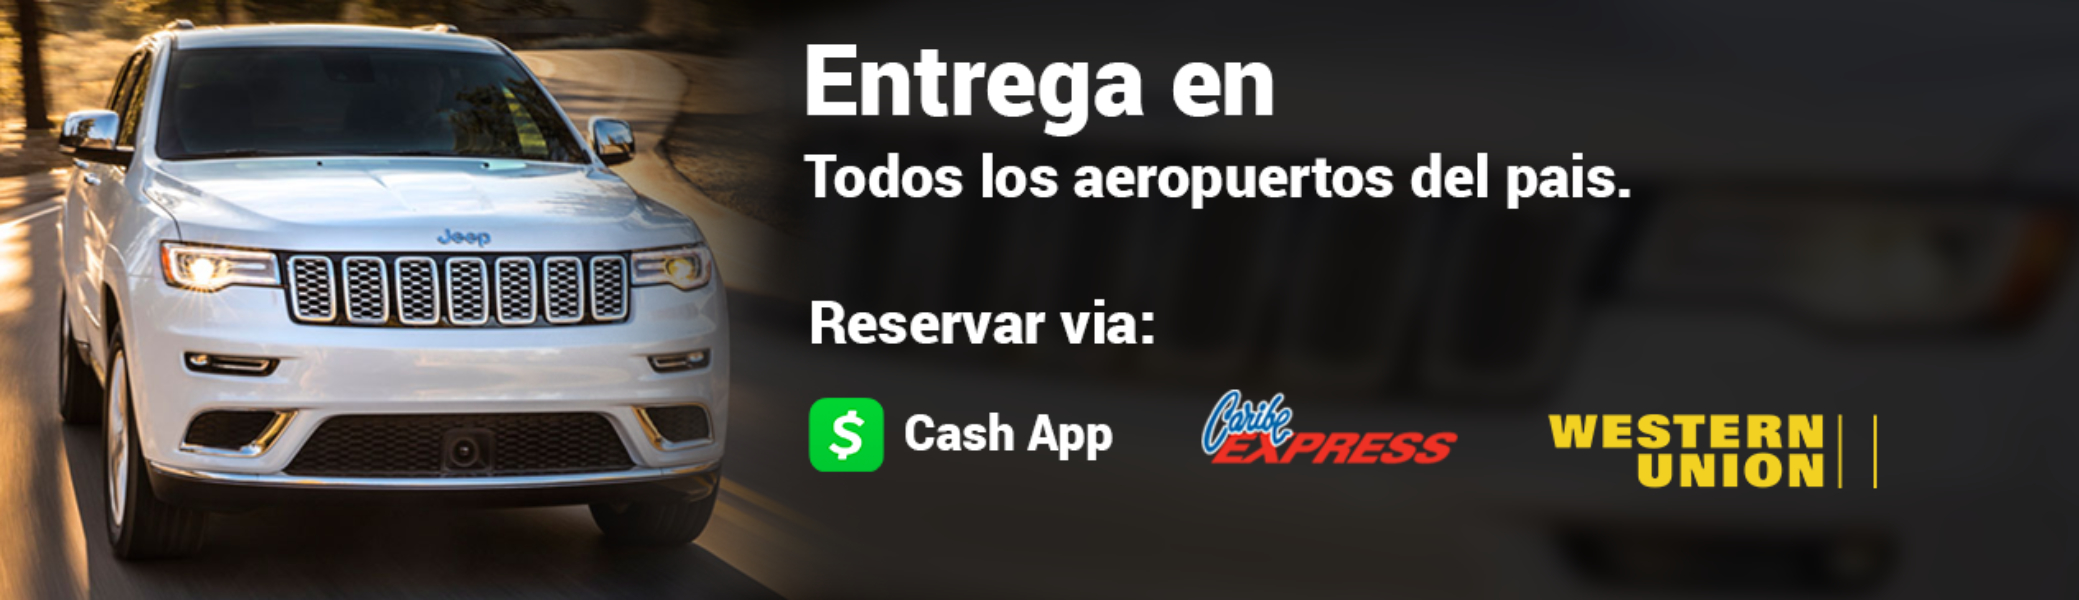 cada Mexico principal  Puma Rent A Car | Vehículos